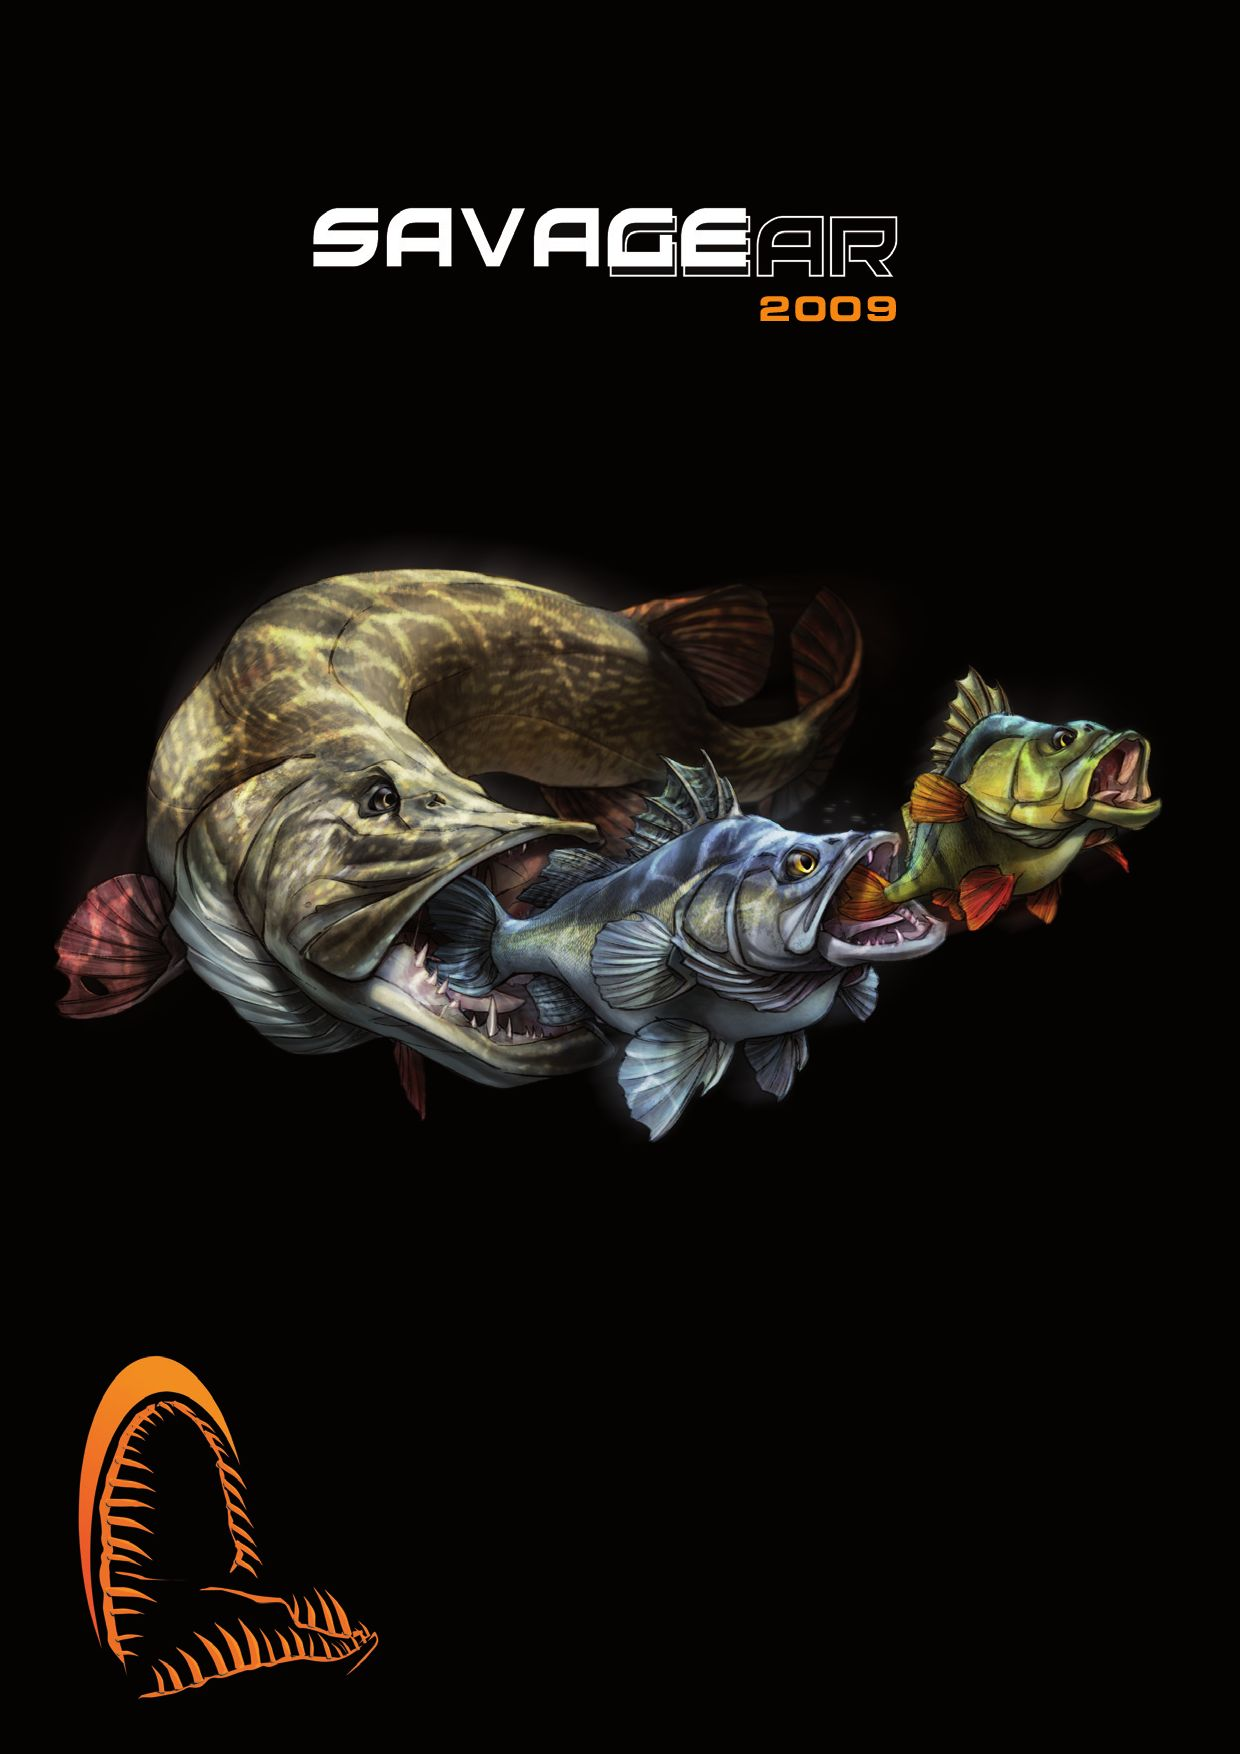 Savage Gear Catalogo 2009 By Johnny Larri Issuu